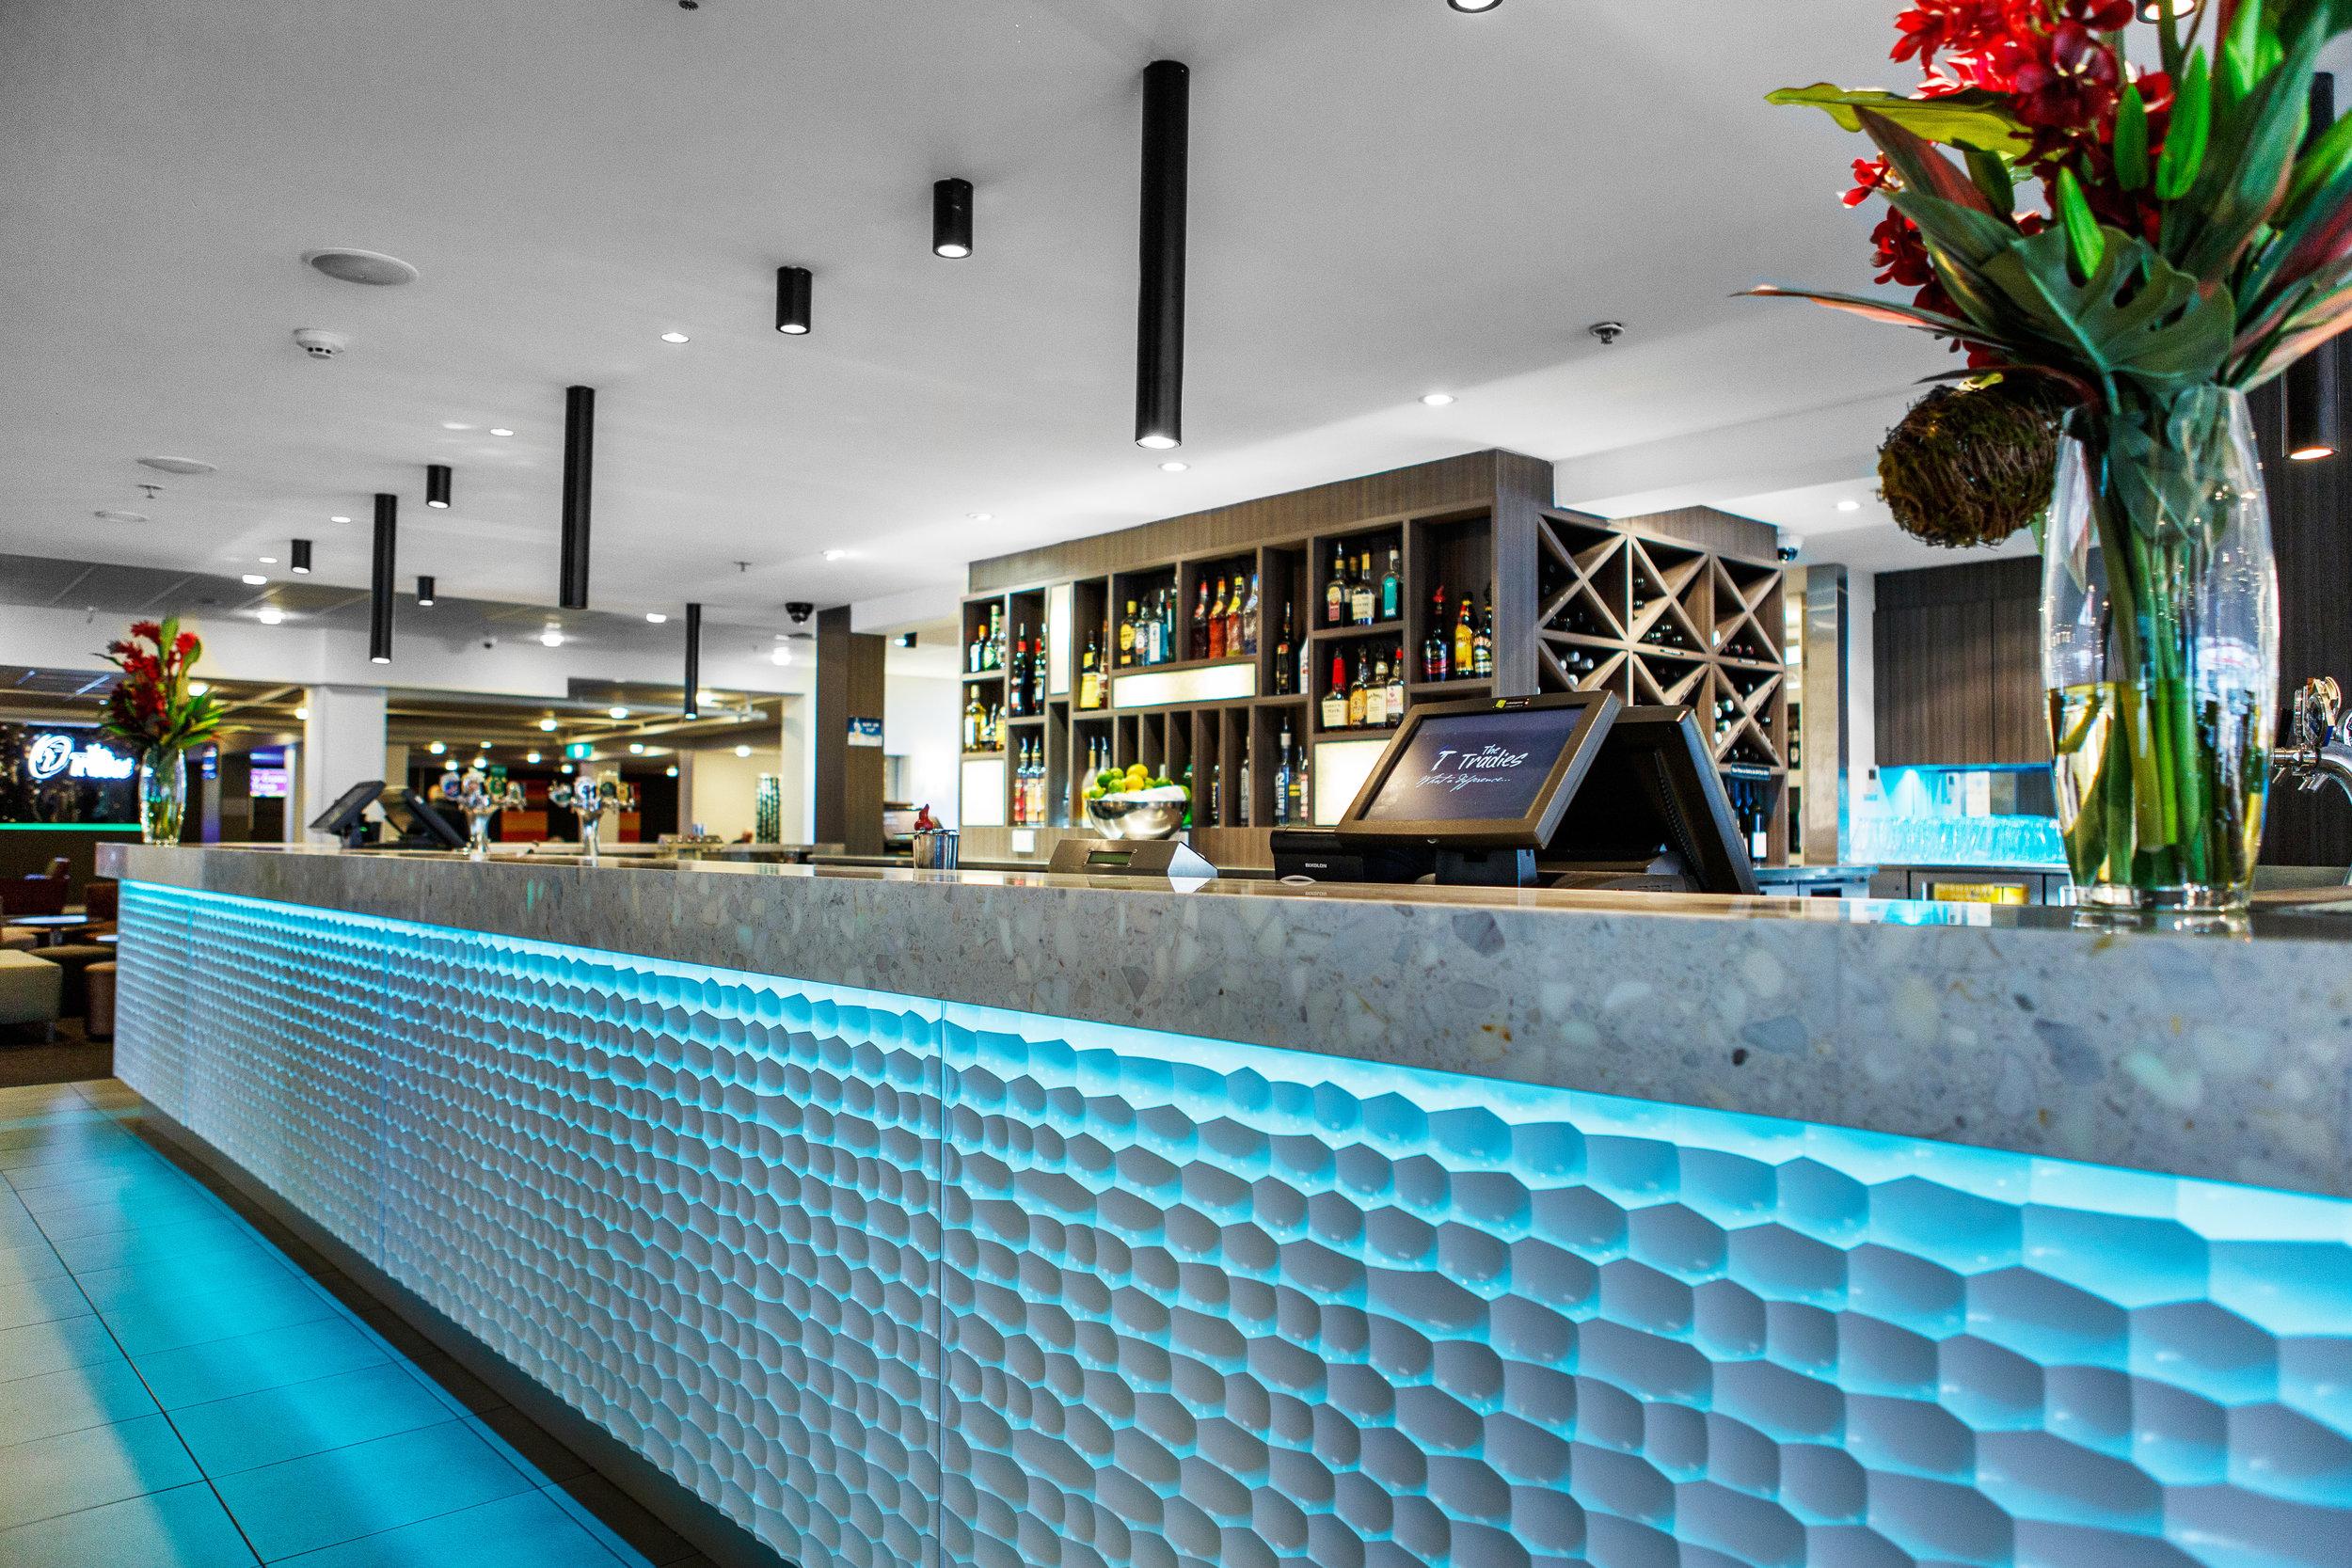 [130725-130726] The Dickson Lounge Bar (Chalk Studio) _0029 [Original].jpg